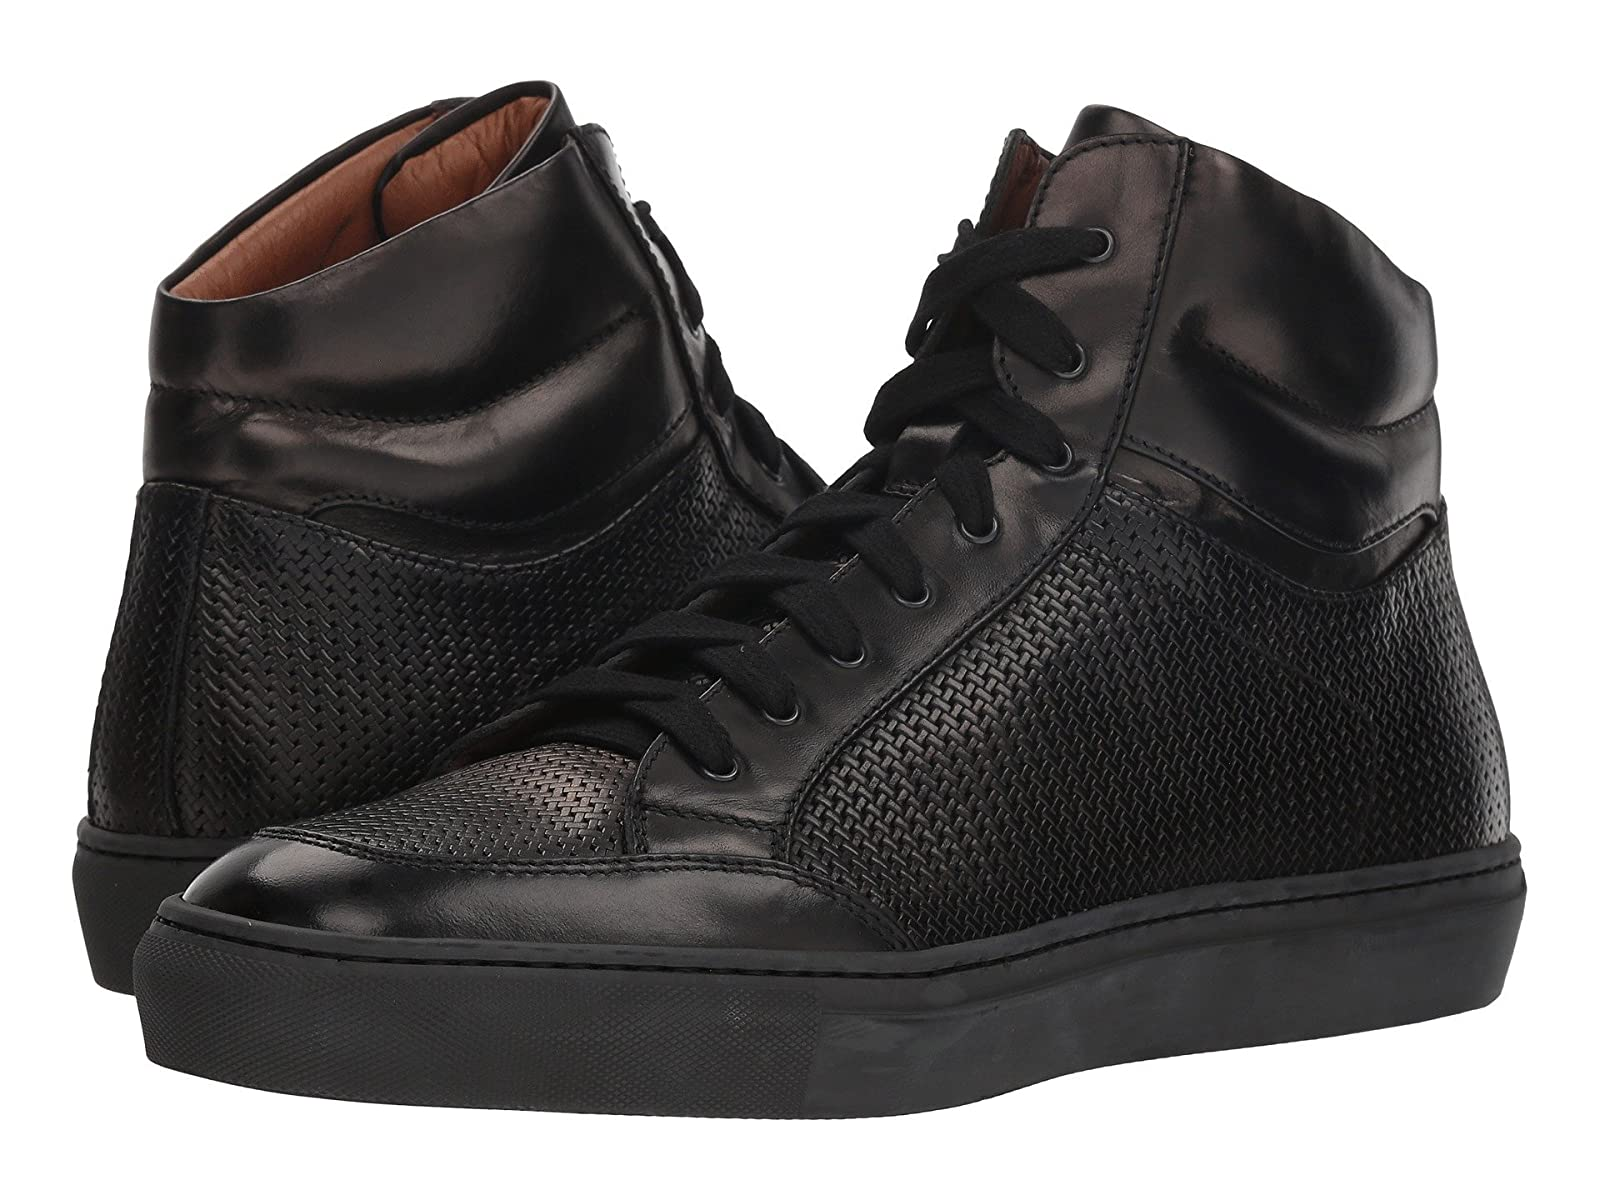 Aquatalia AsherCheap and distinctive eye-catching shoes